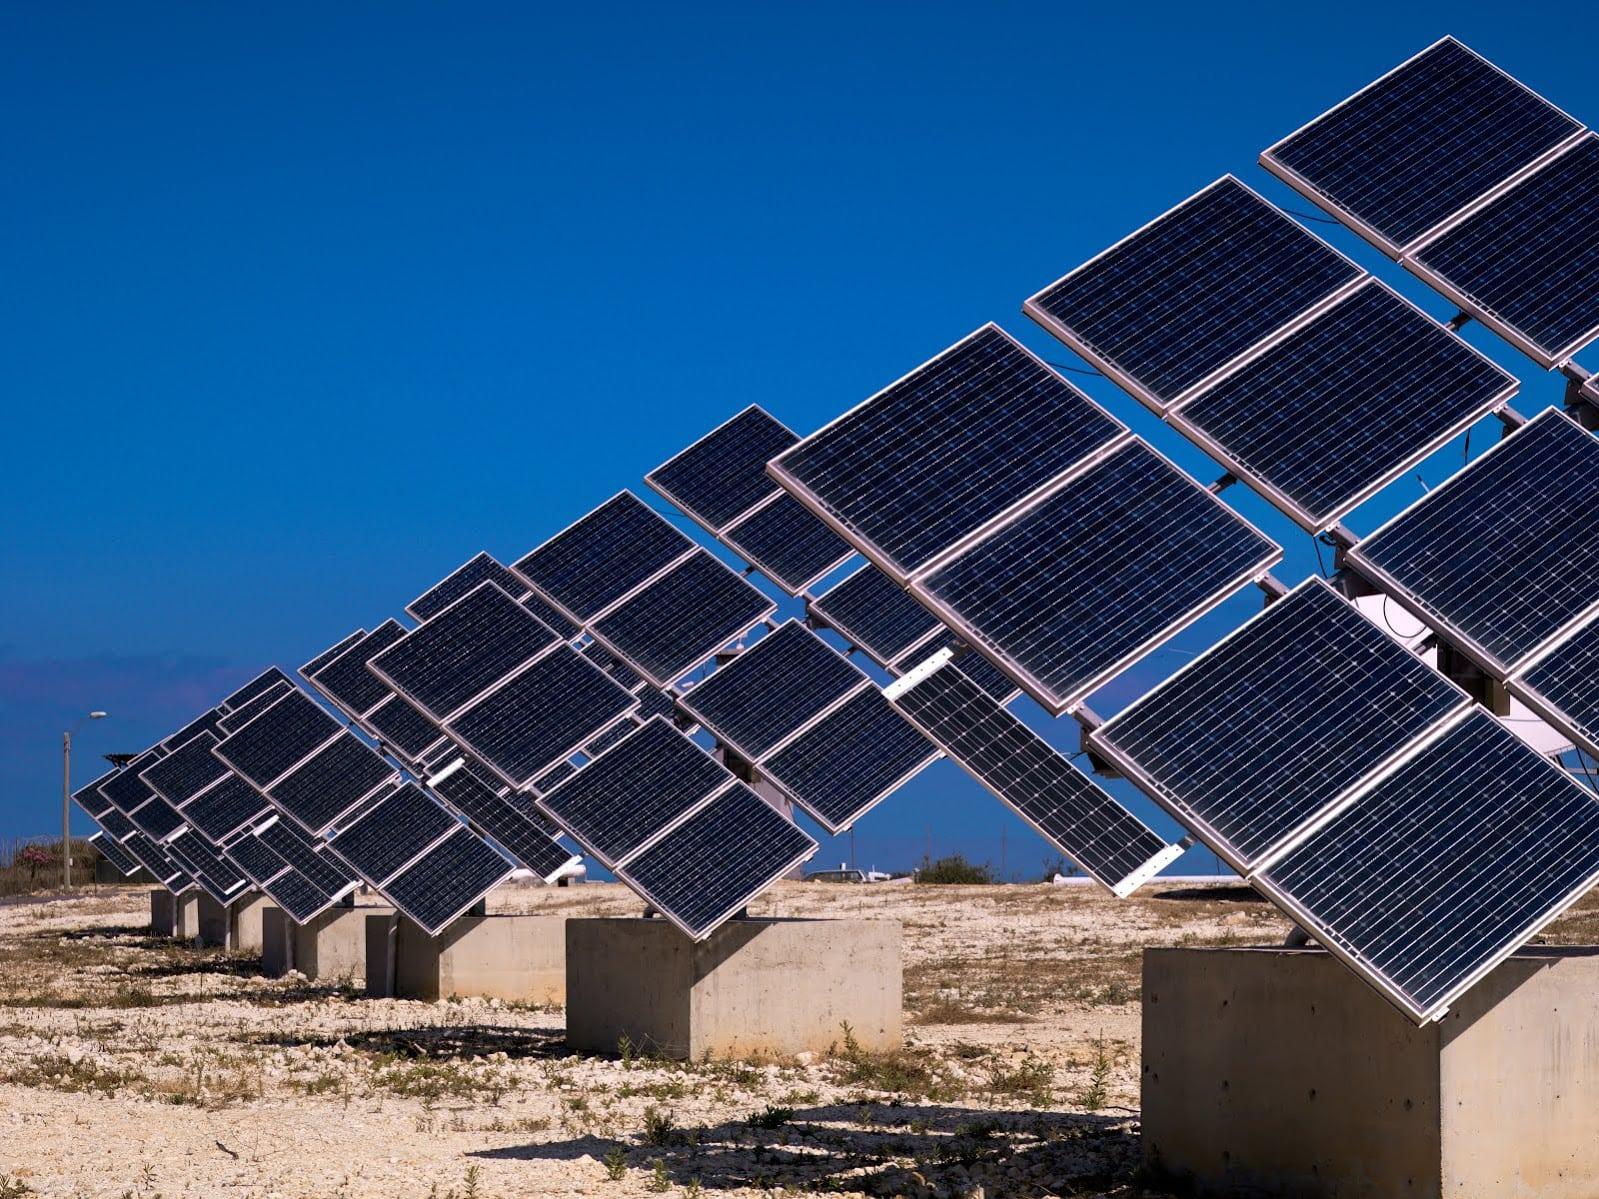 Photo: Solar panels